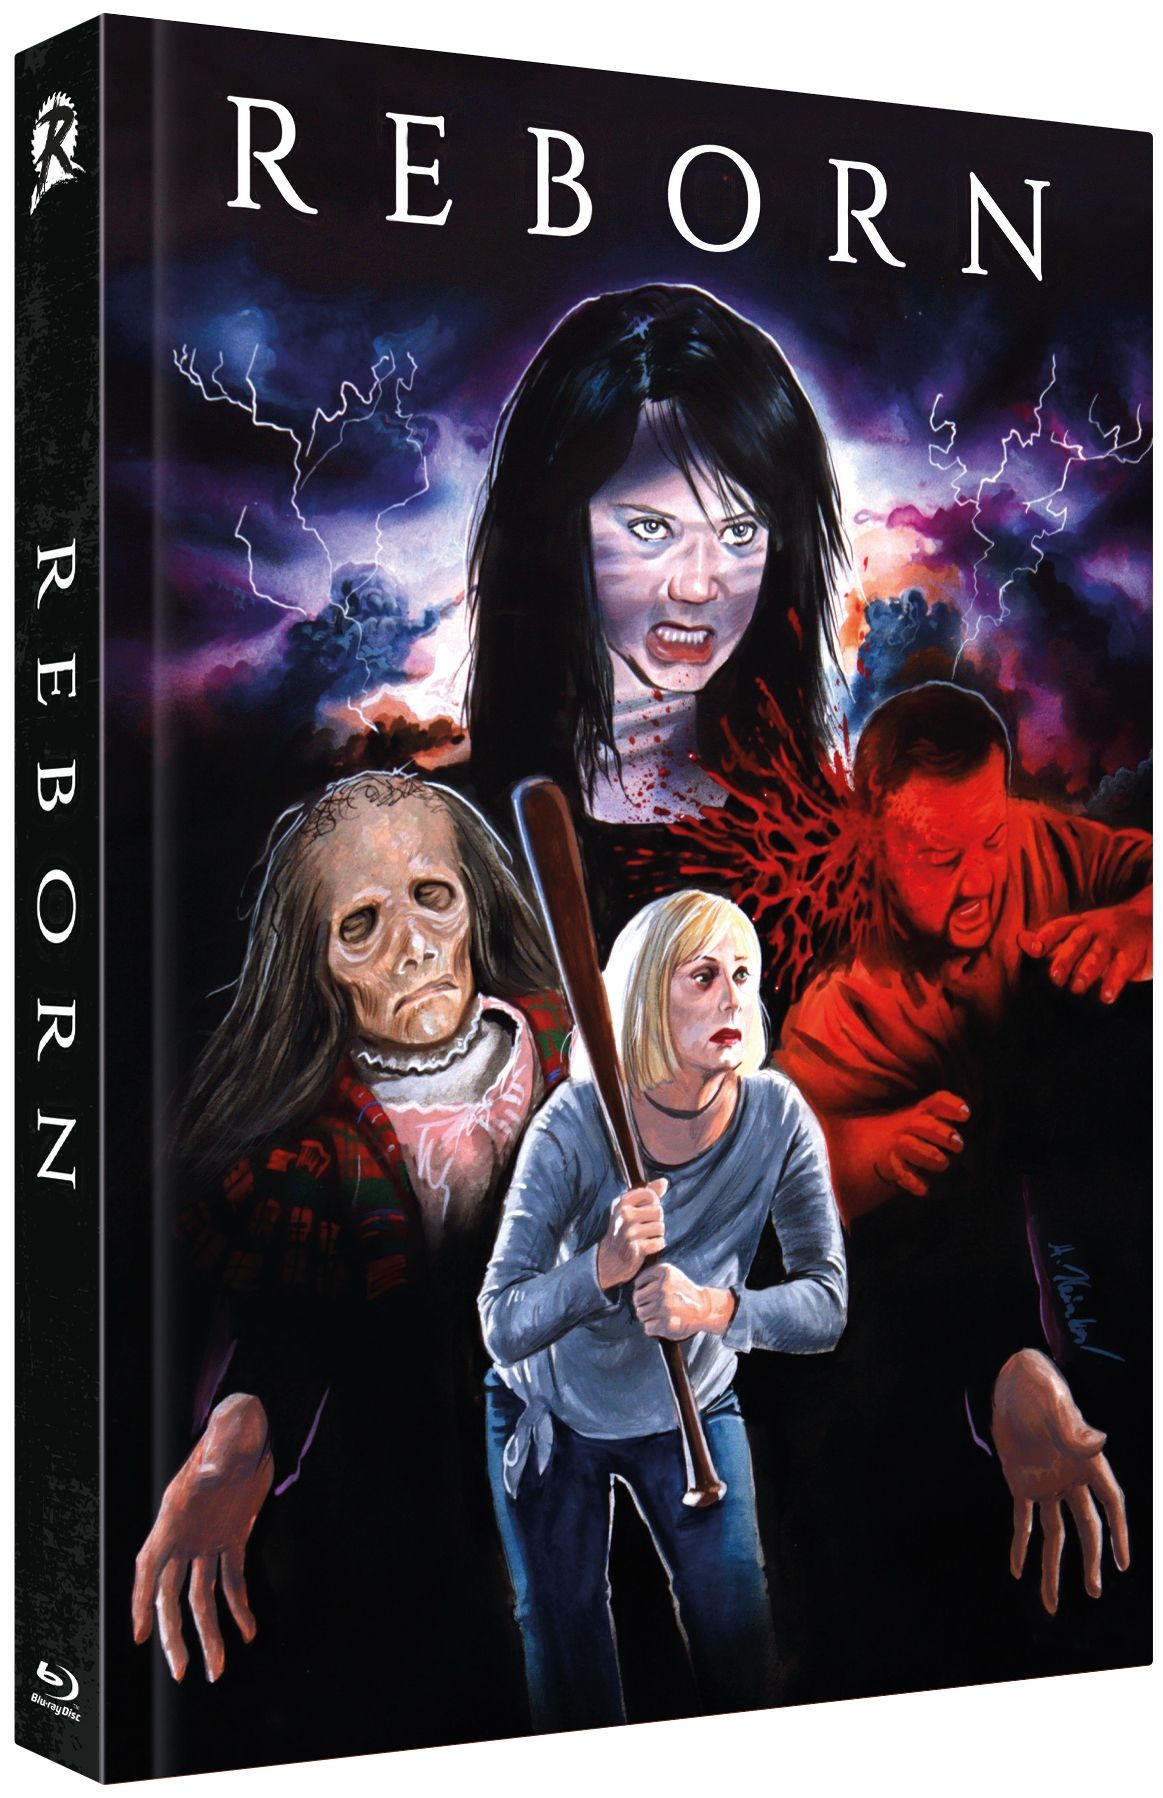 Reborn (Lim. Uncut Mediabook - Cover B) (DVD + BLURAY)